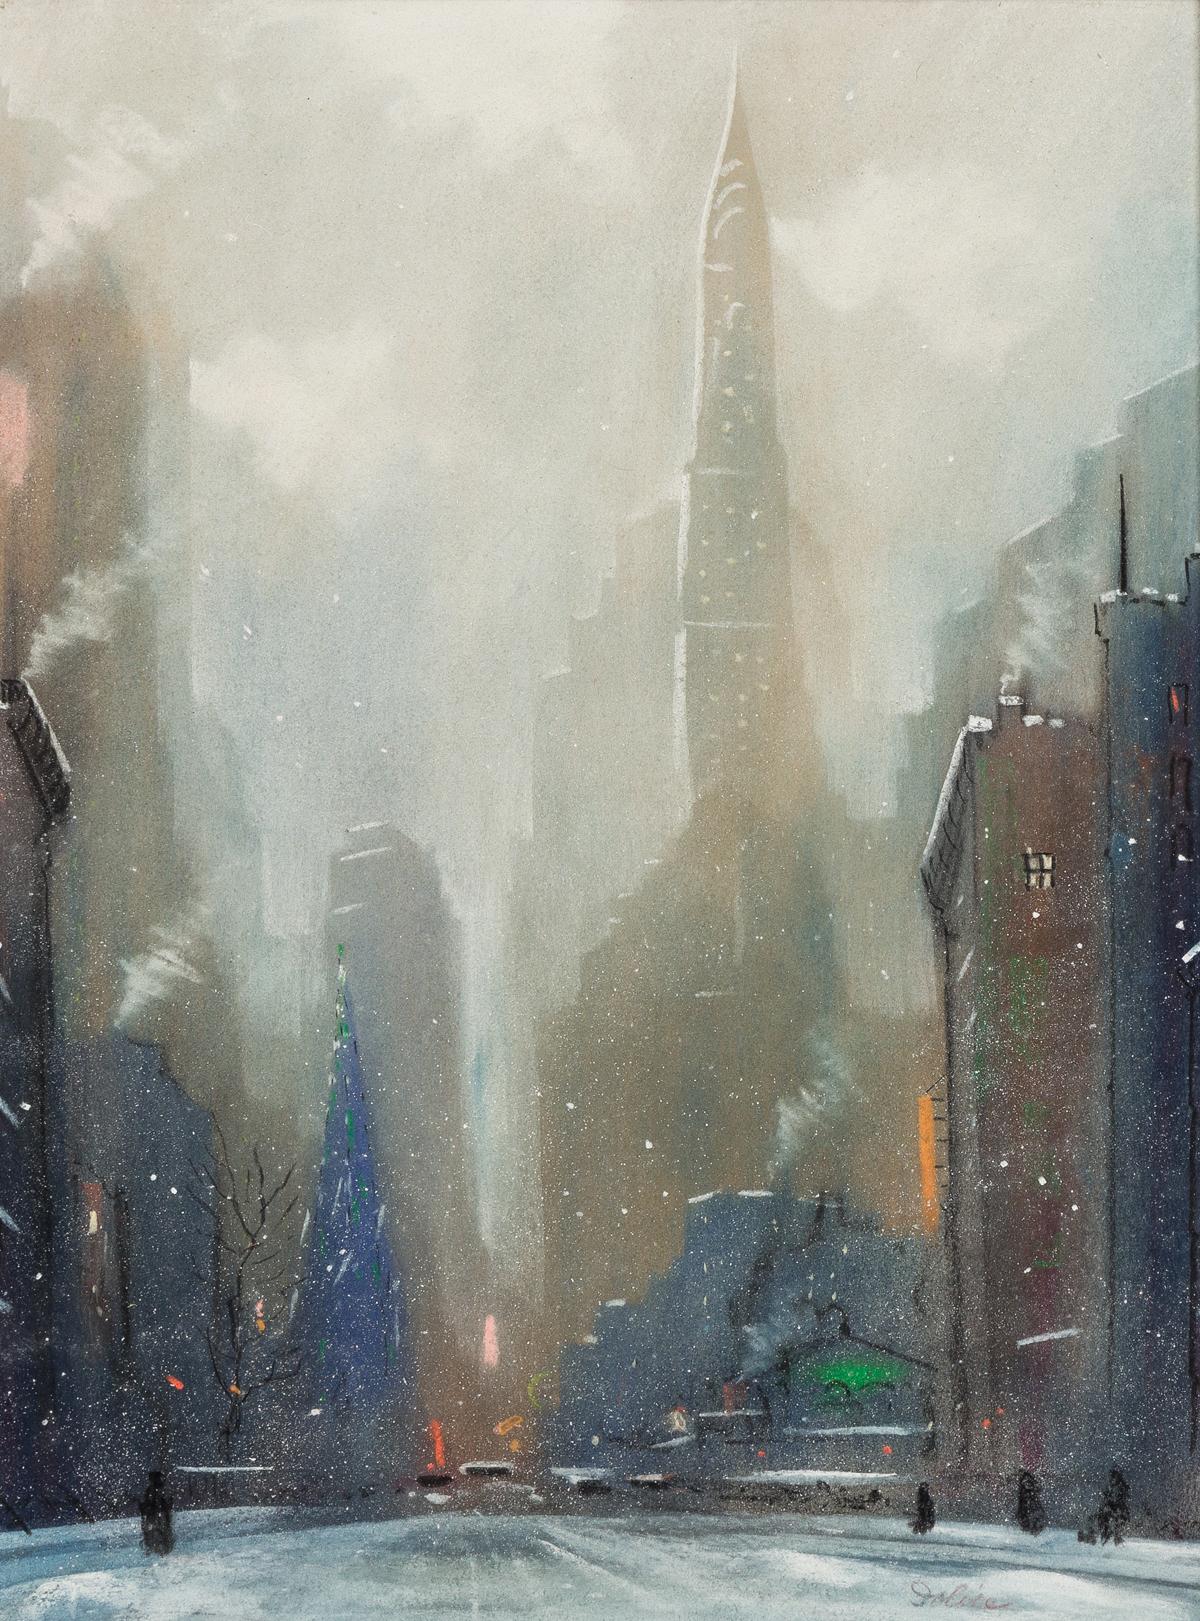 LEON DOLICE Chrysler Building at Christmas.